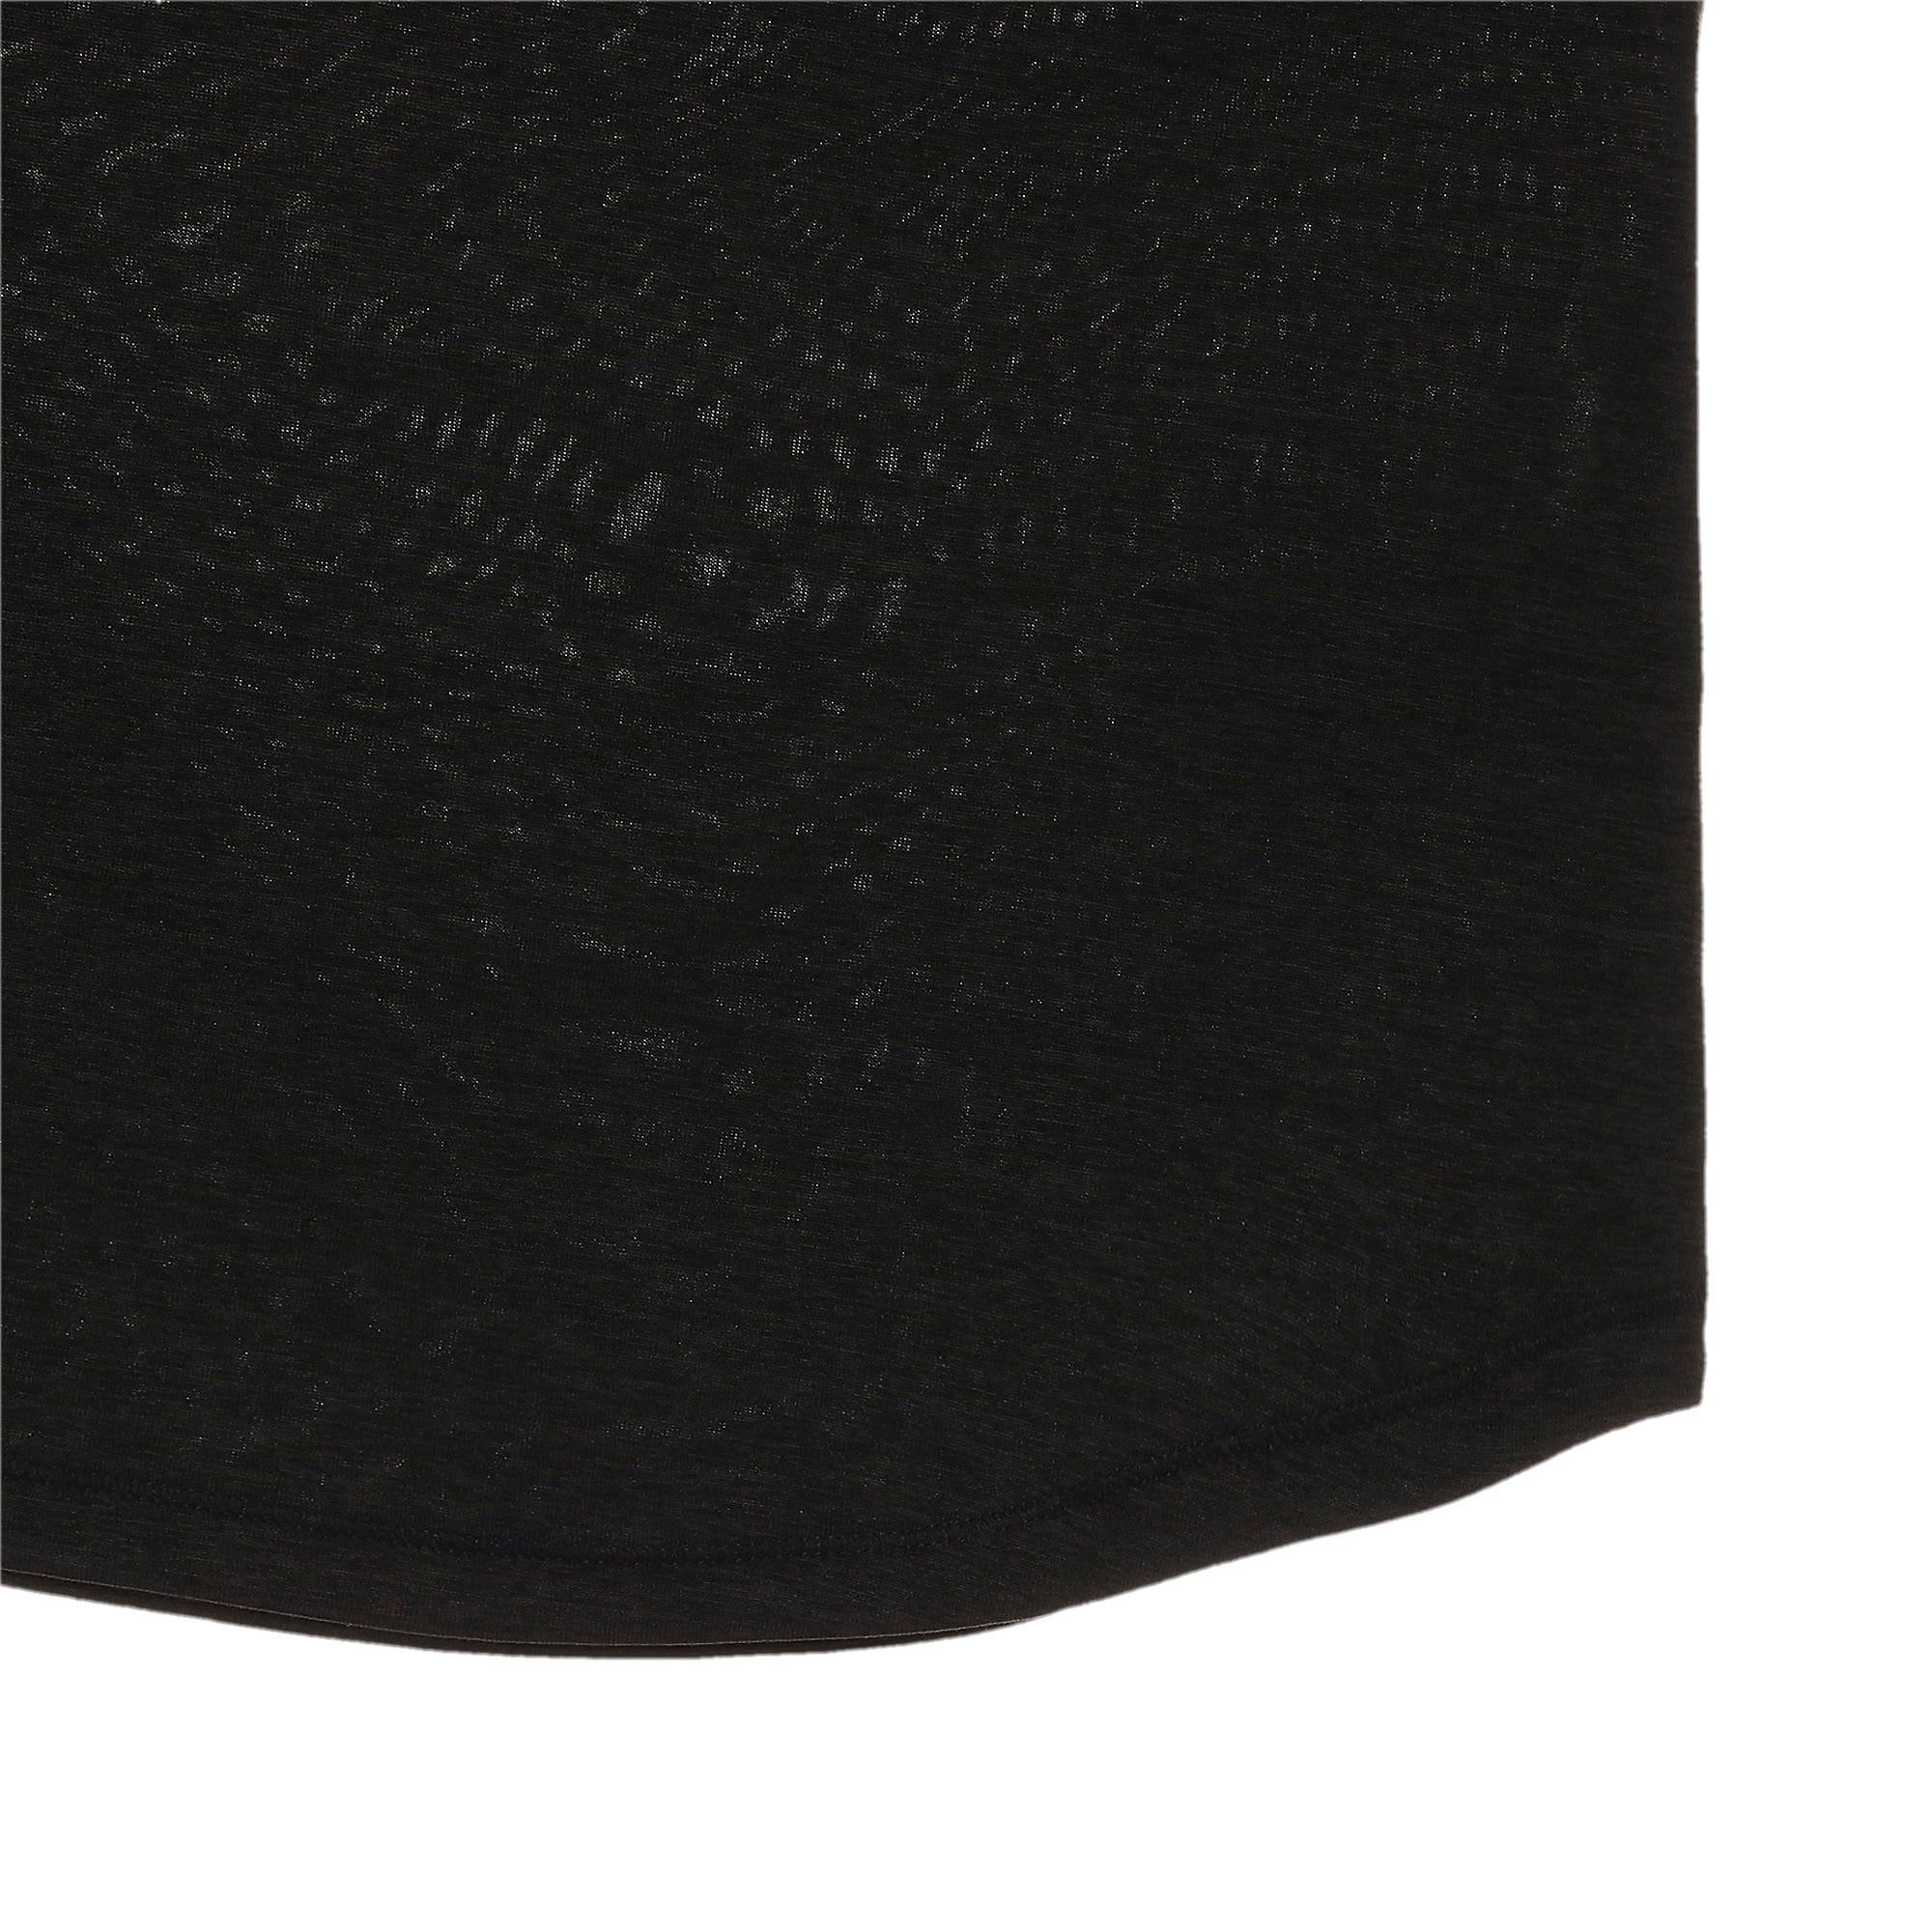 Thumbnail 9 of ヘザー キャット ウィメンズ ランニング Tシャツ 半袖, Puma Black, medium-JPN